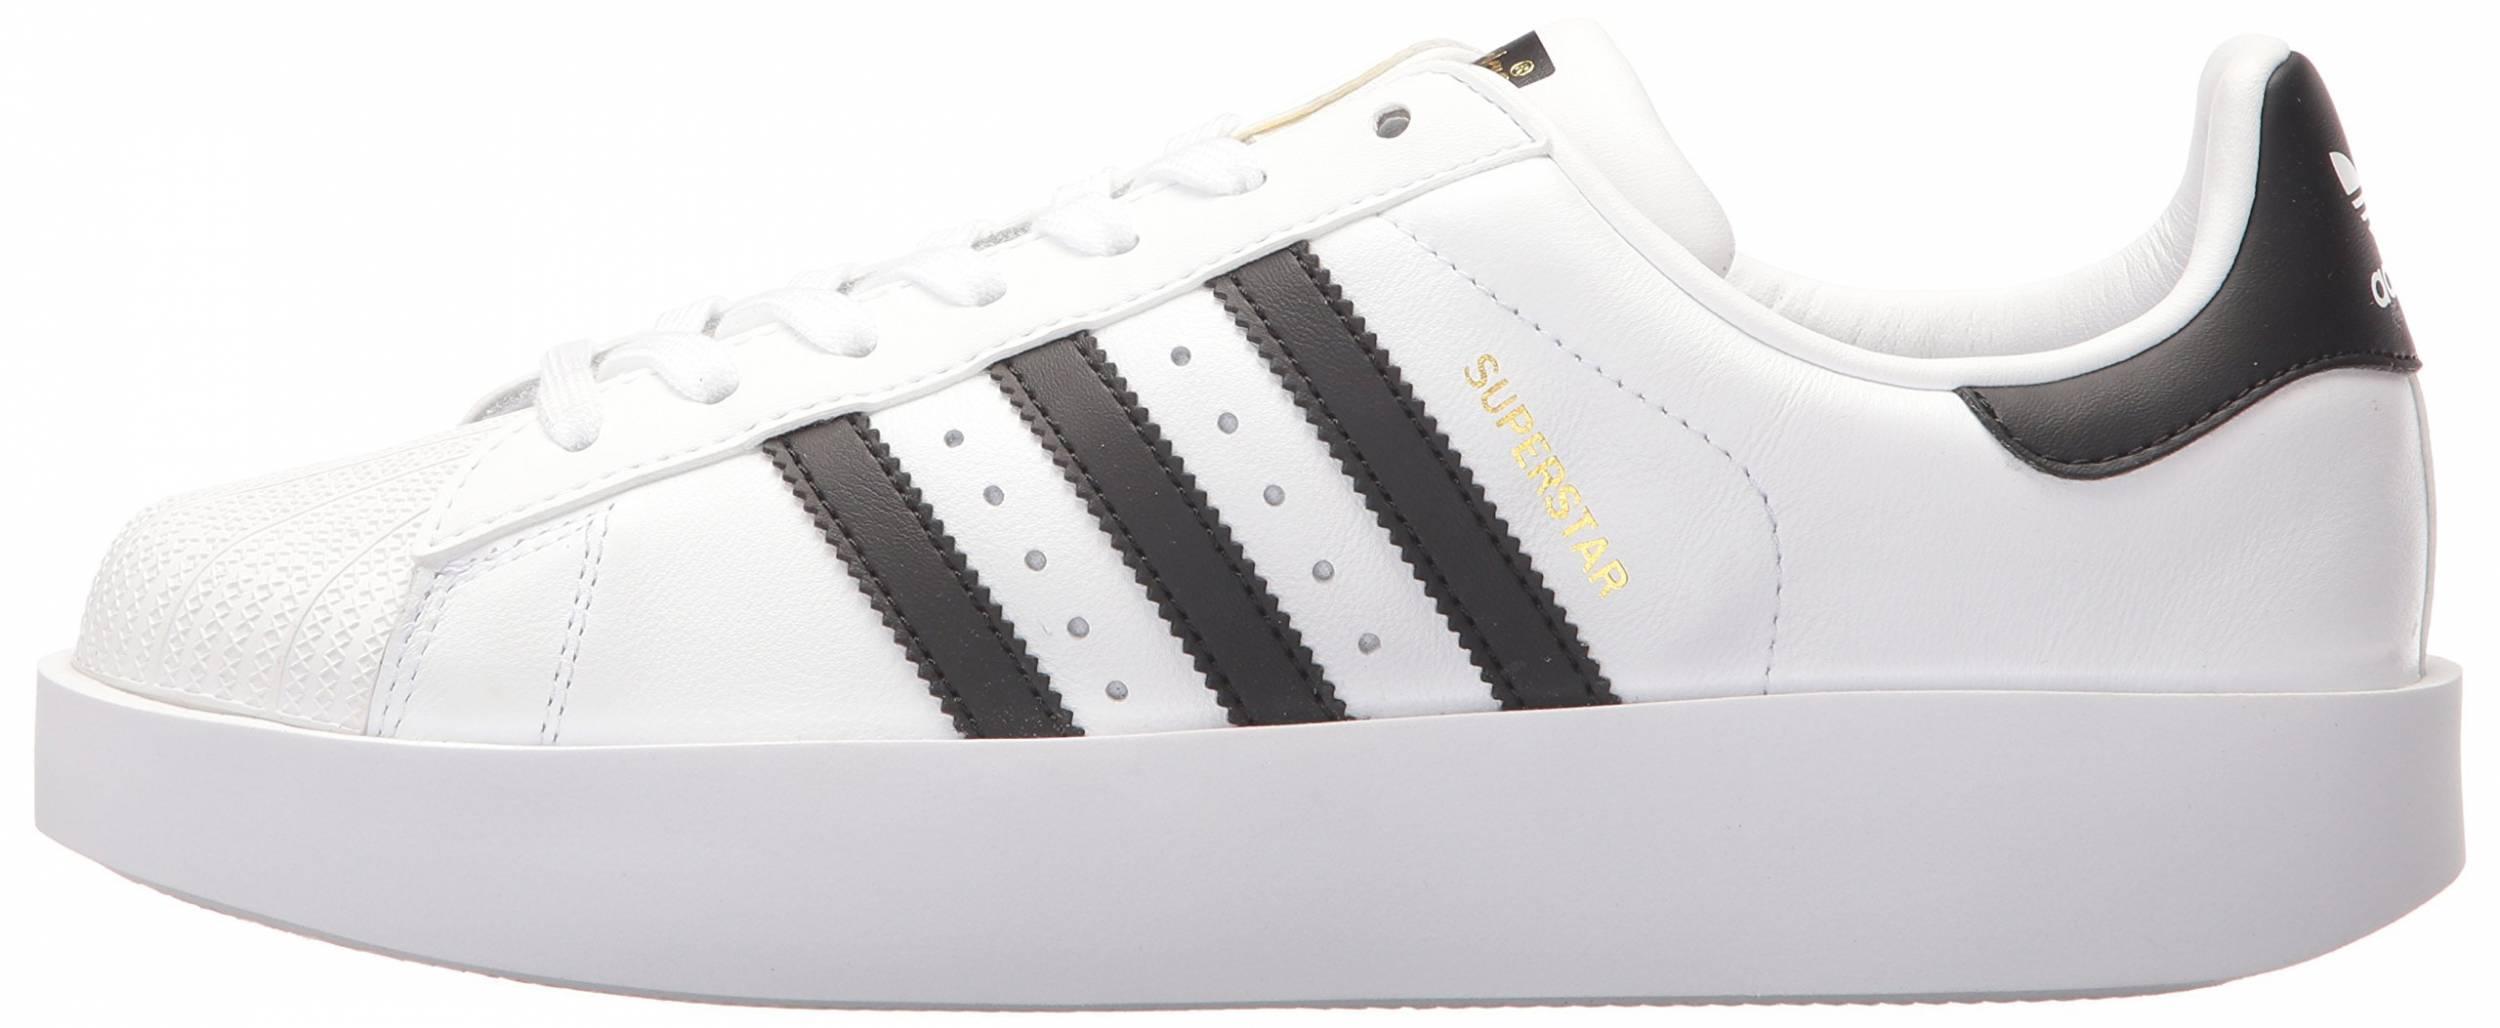 Adidas Superstar Bold Platform